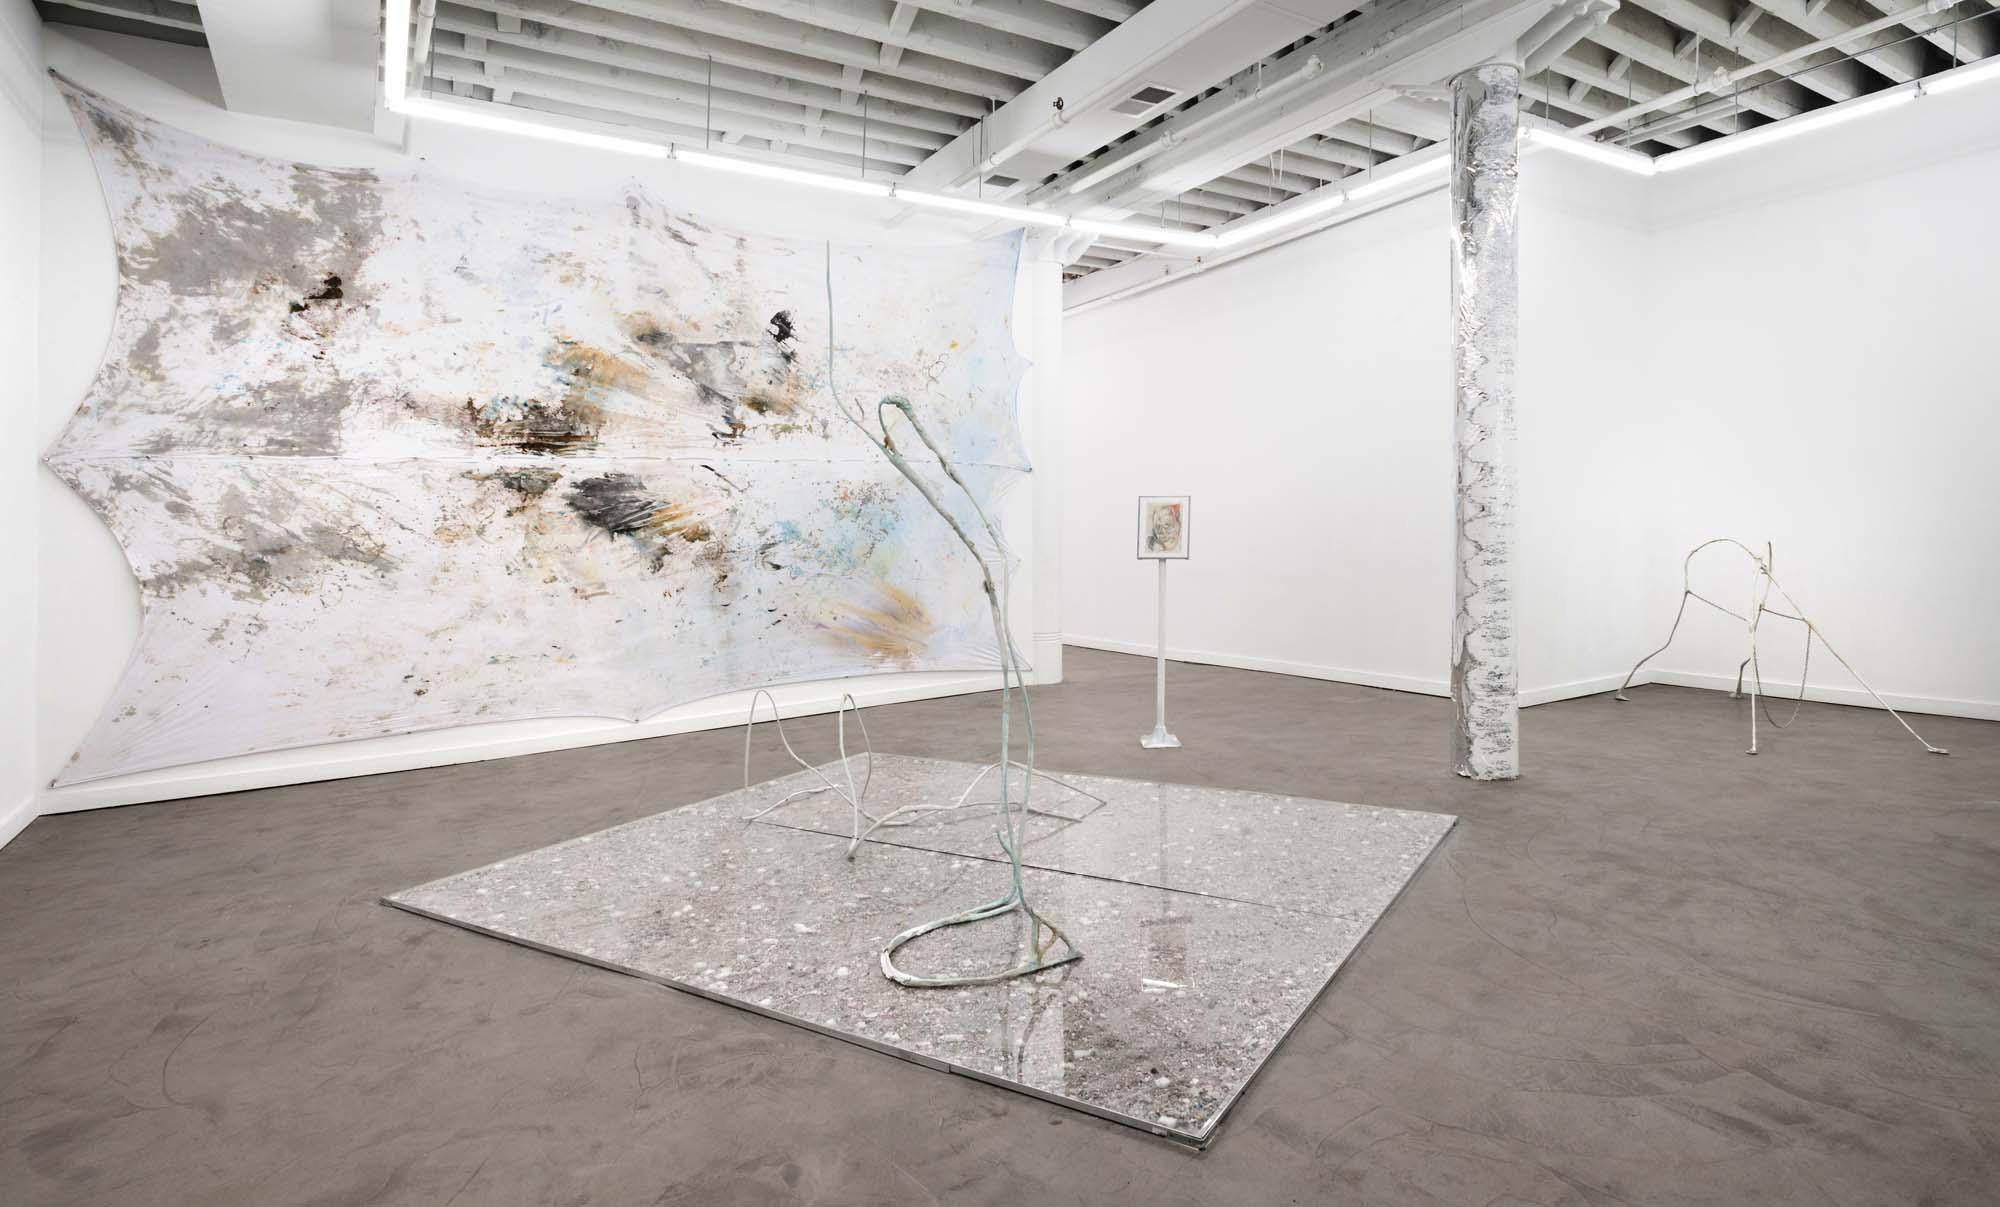 Flesh Club Installation view, Western Exhibitions, 2013